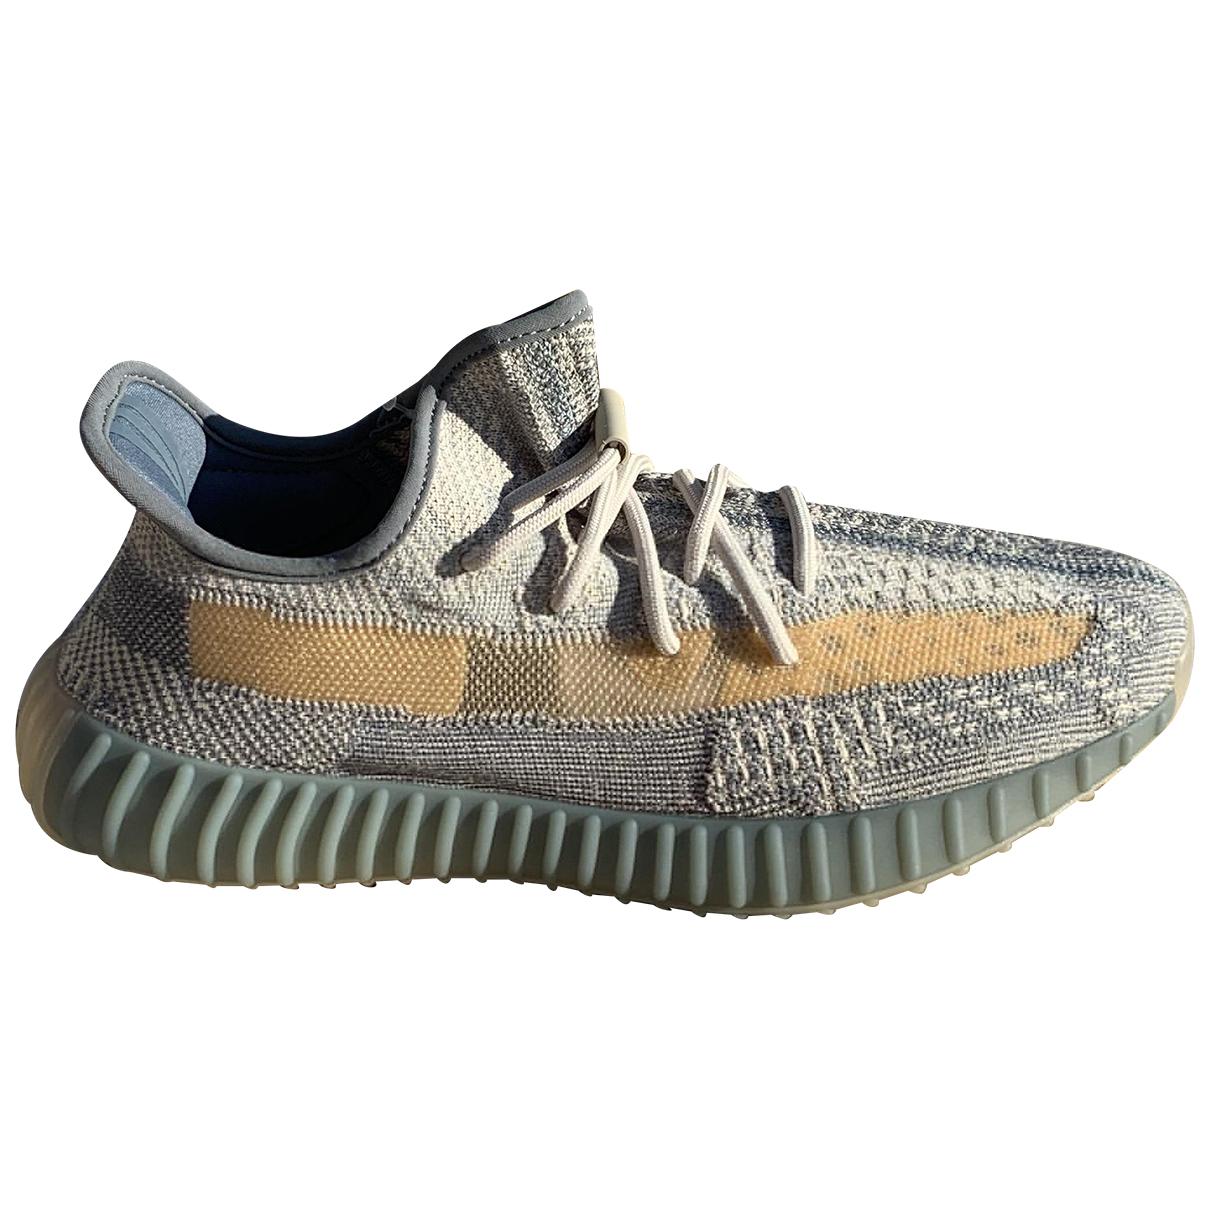 Yeezy X Adidas - Baskets Boost 350 V2 pour homme en toile - gris